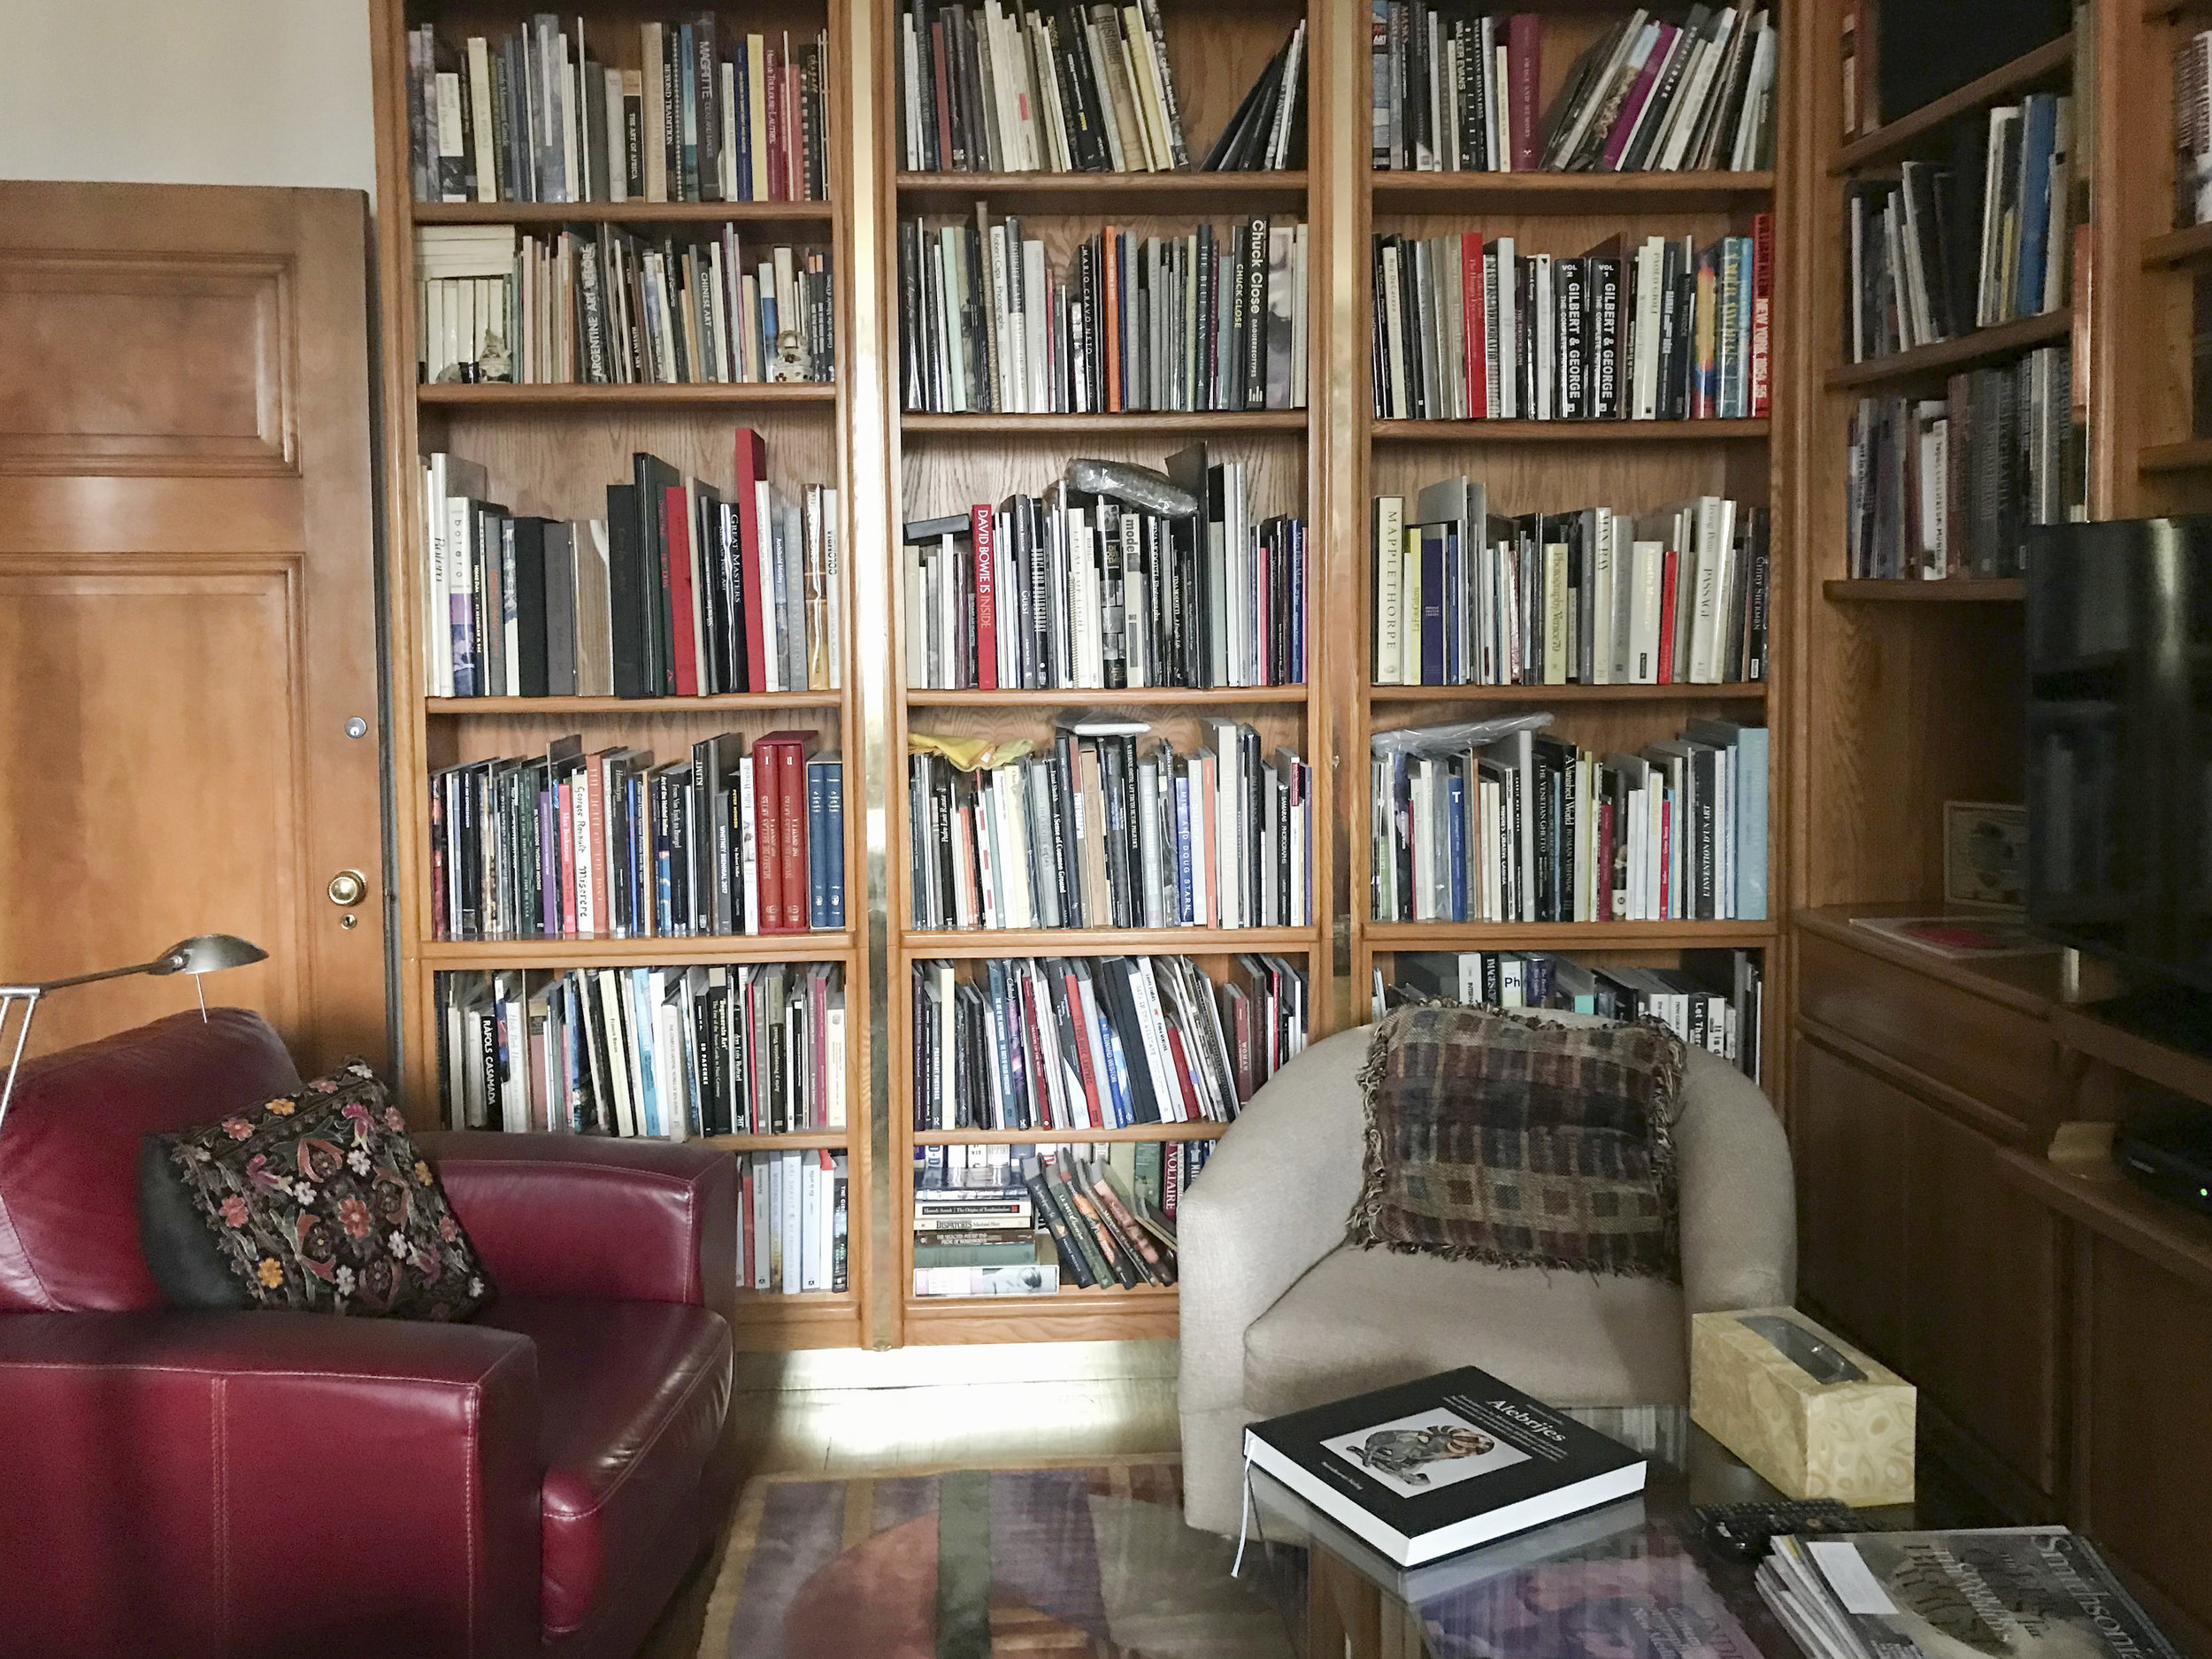 Martha Schneider 's cozy photobook library